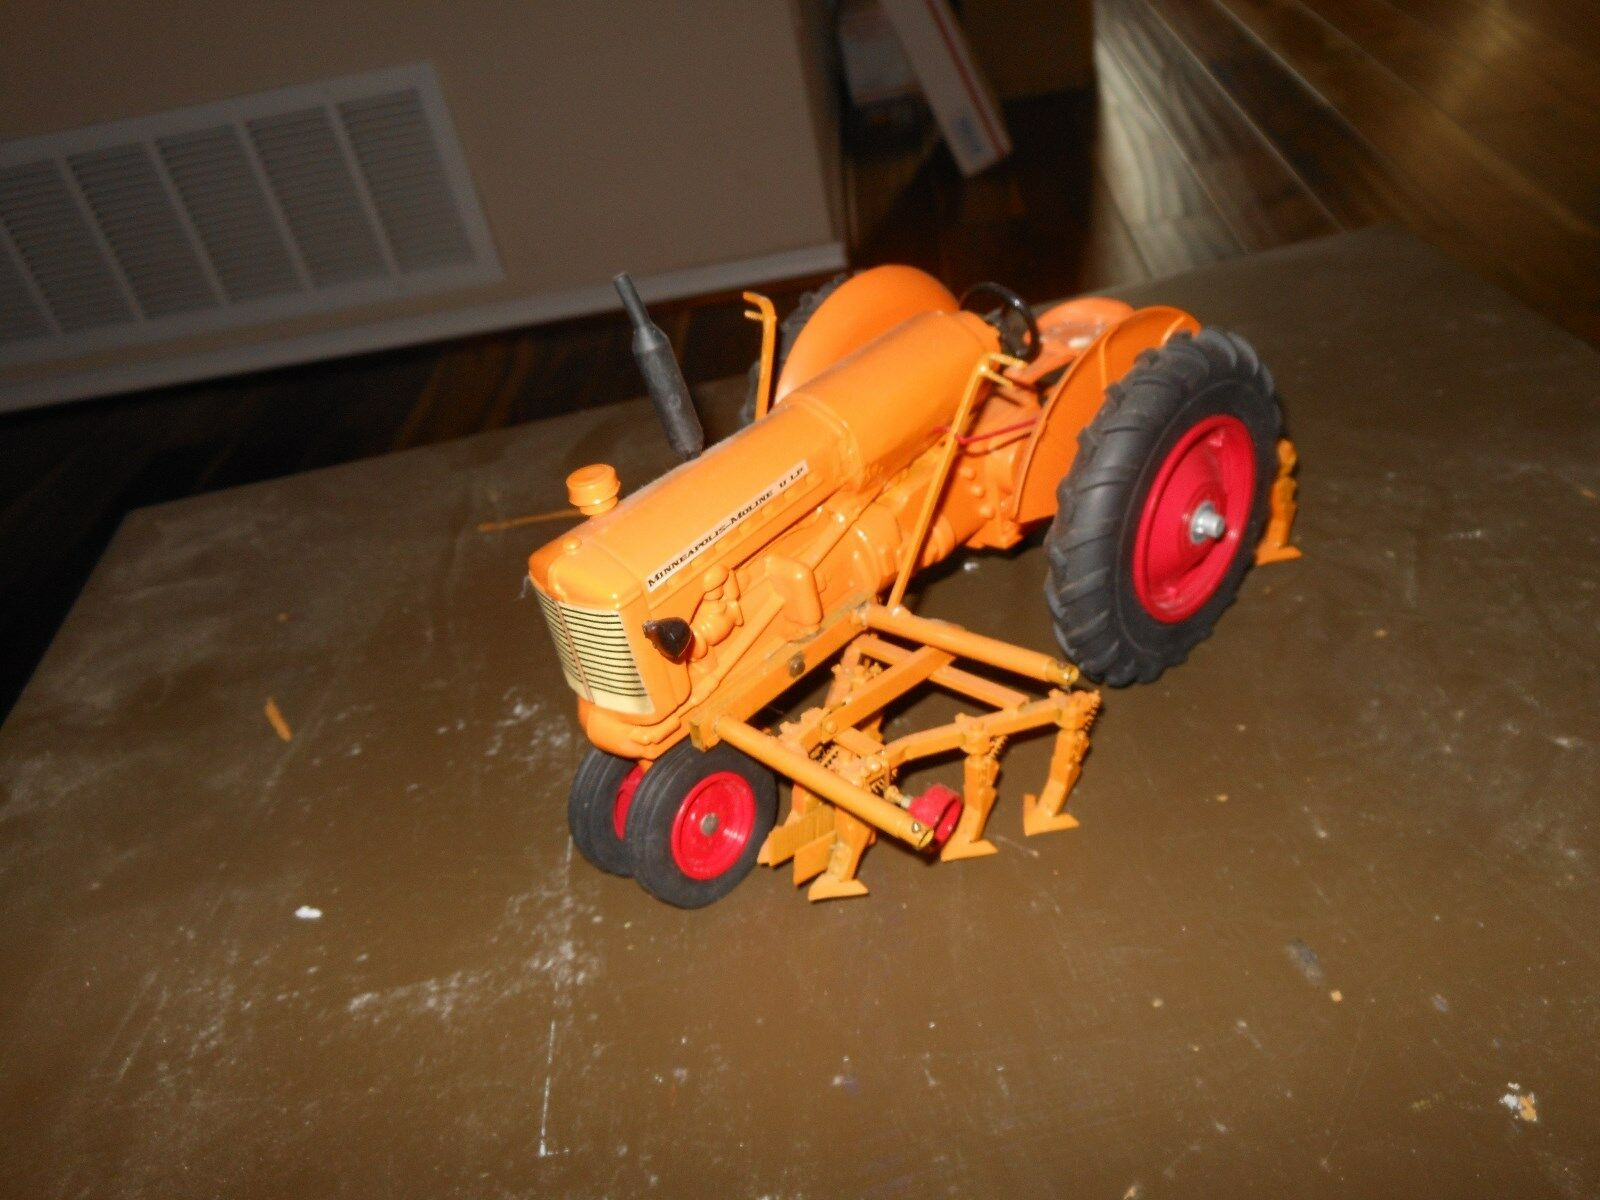 Minneapolis Moline  U  lp-gas toy tractor  (White, Oliver) 1 16    w cultivators